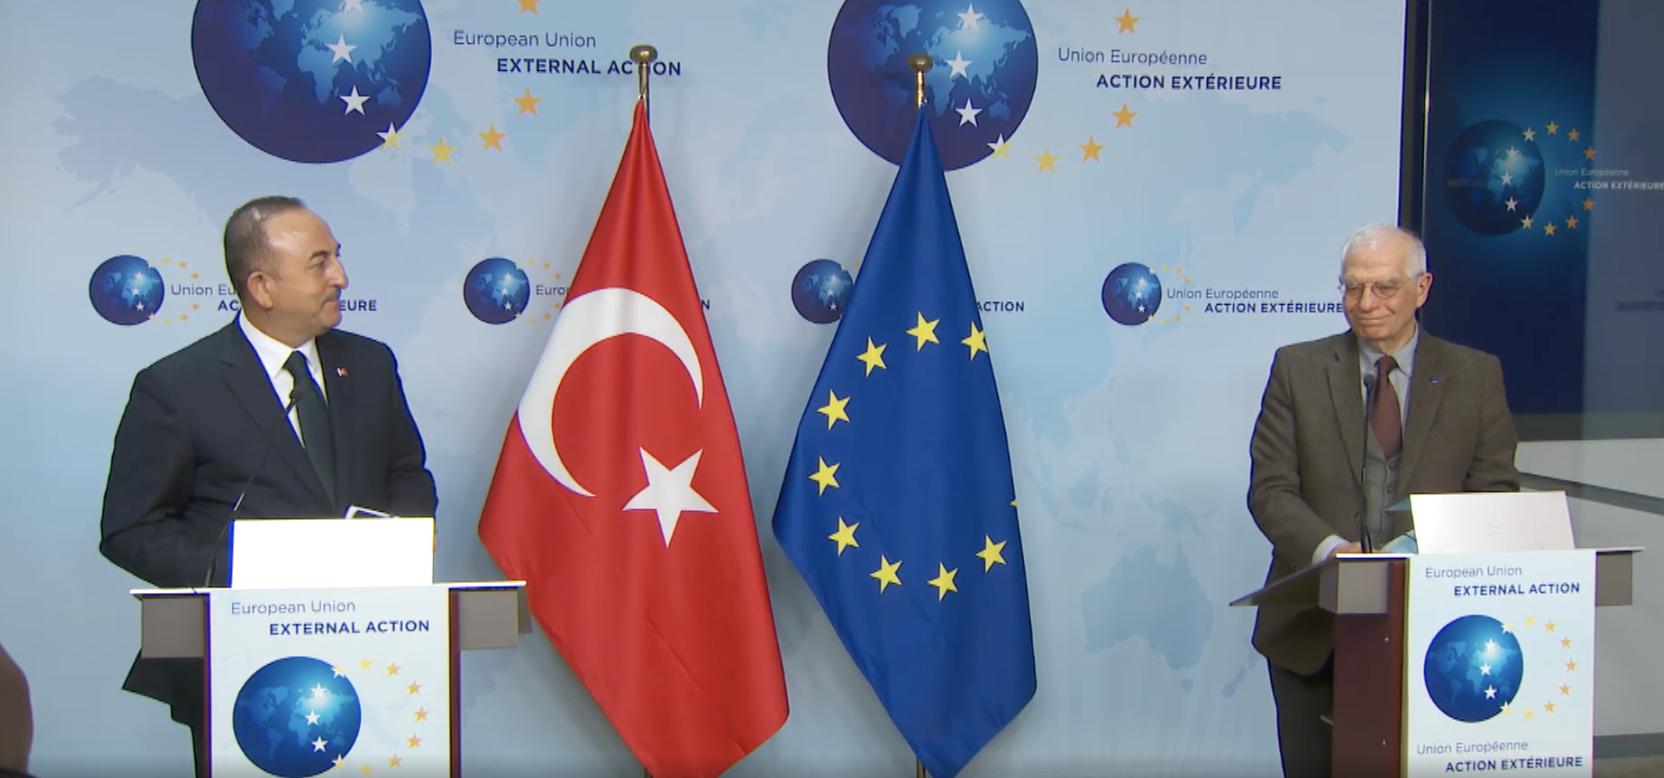 Çavuşoĝlu: Οι σχέσεις Τουρκίας ΕΕ είναι σημαντικές για την ευημερία στην περιοχή μας